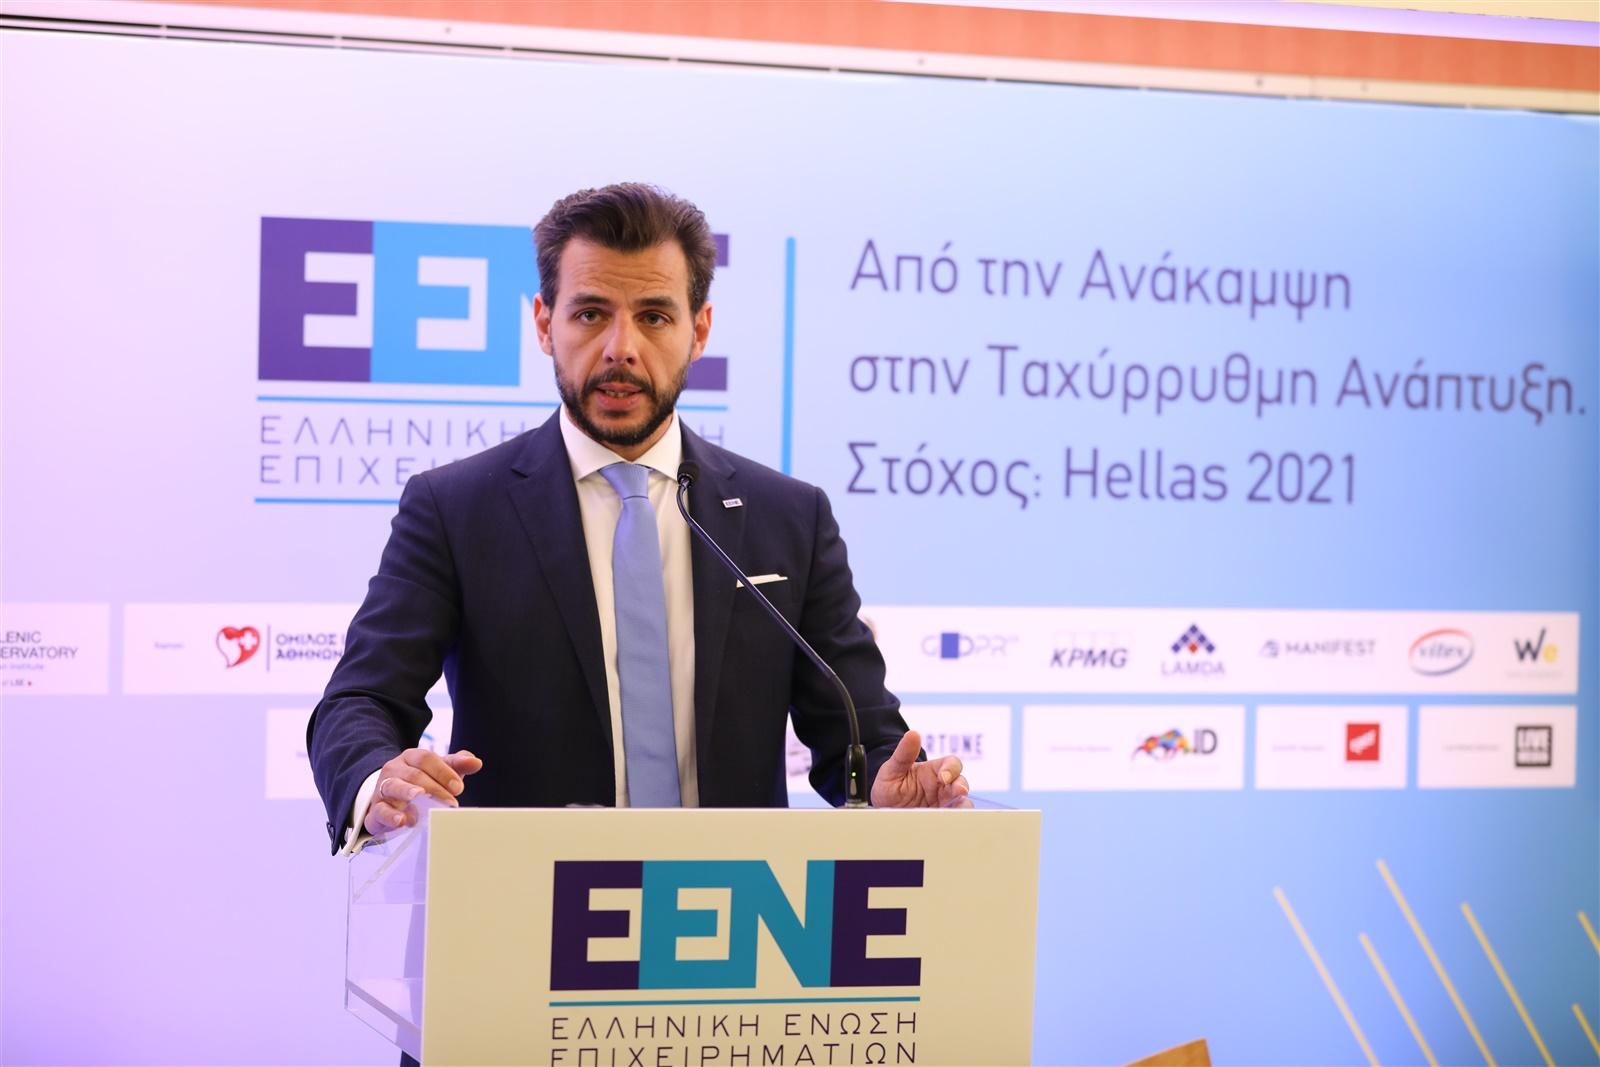 EENE: Όλα όσα έγιναν στην 5η Ετήσια Διάσκεψη με θέμα την επόμενη μέρα της Ελλάδας